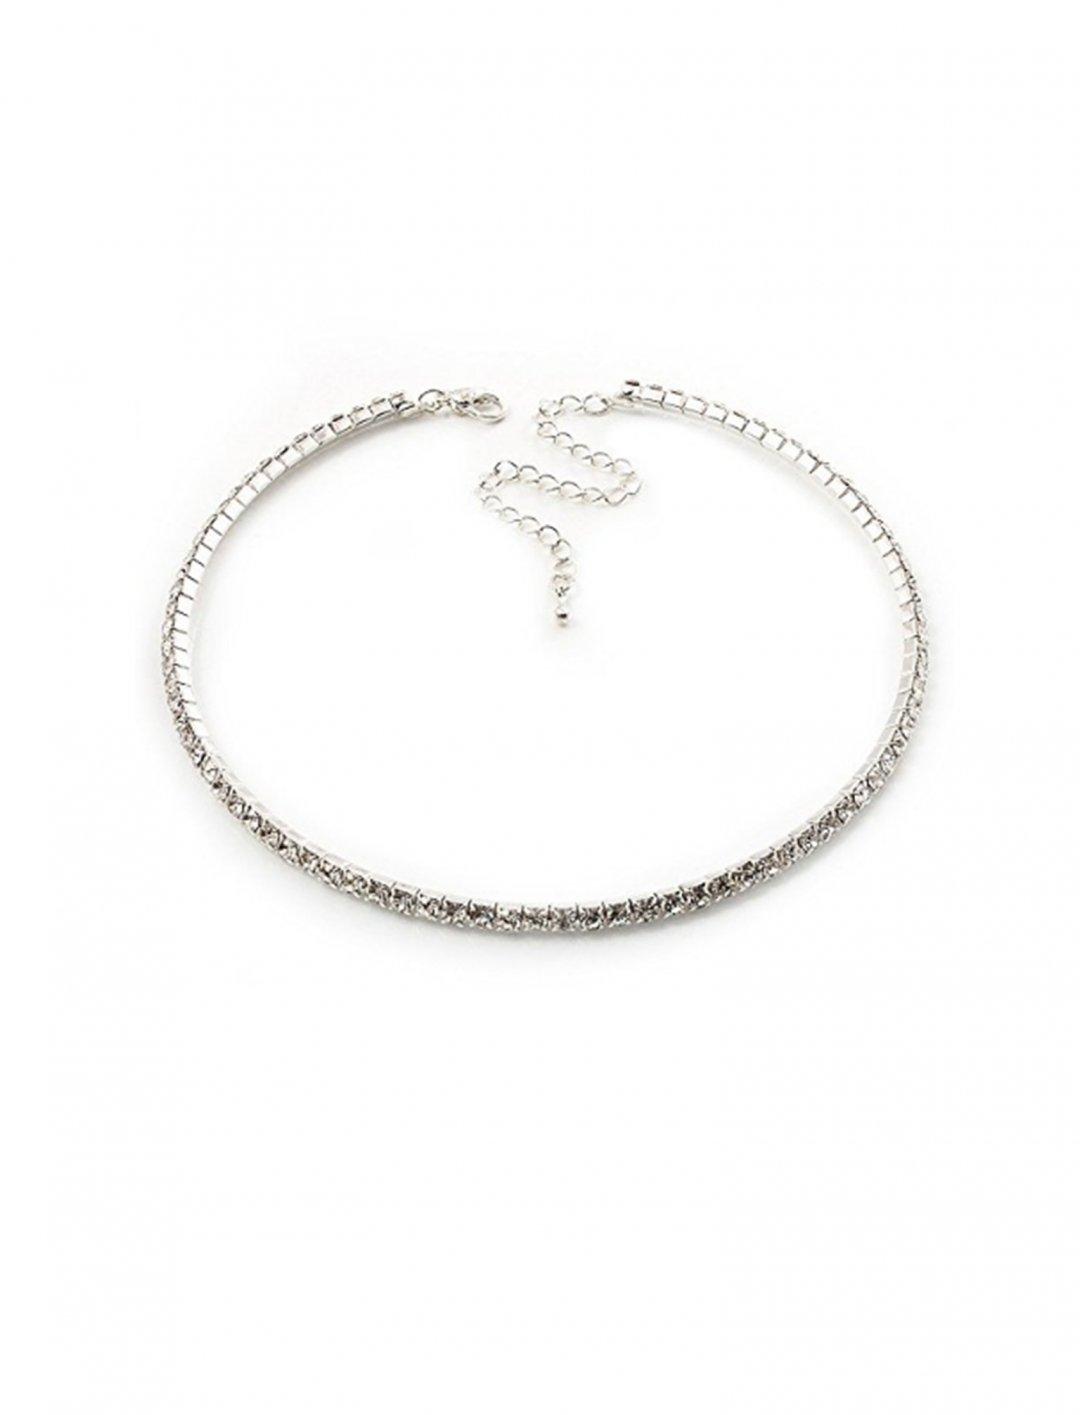 Crystal Choker Necklace Jewellery Avalaya